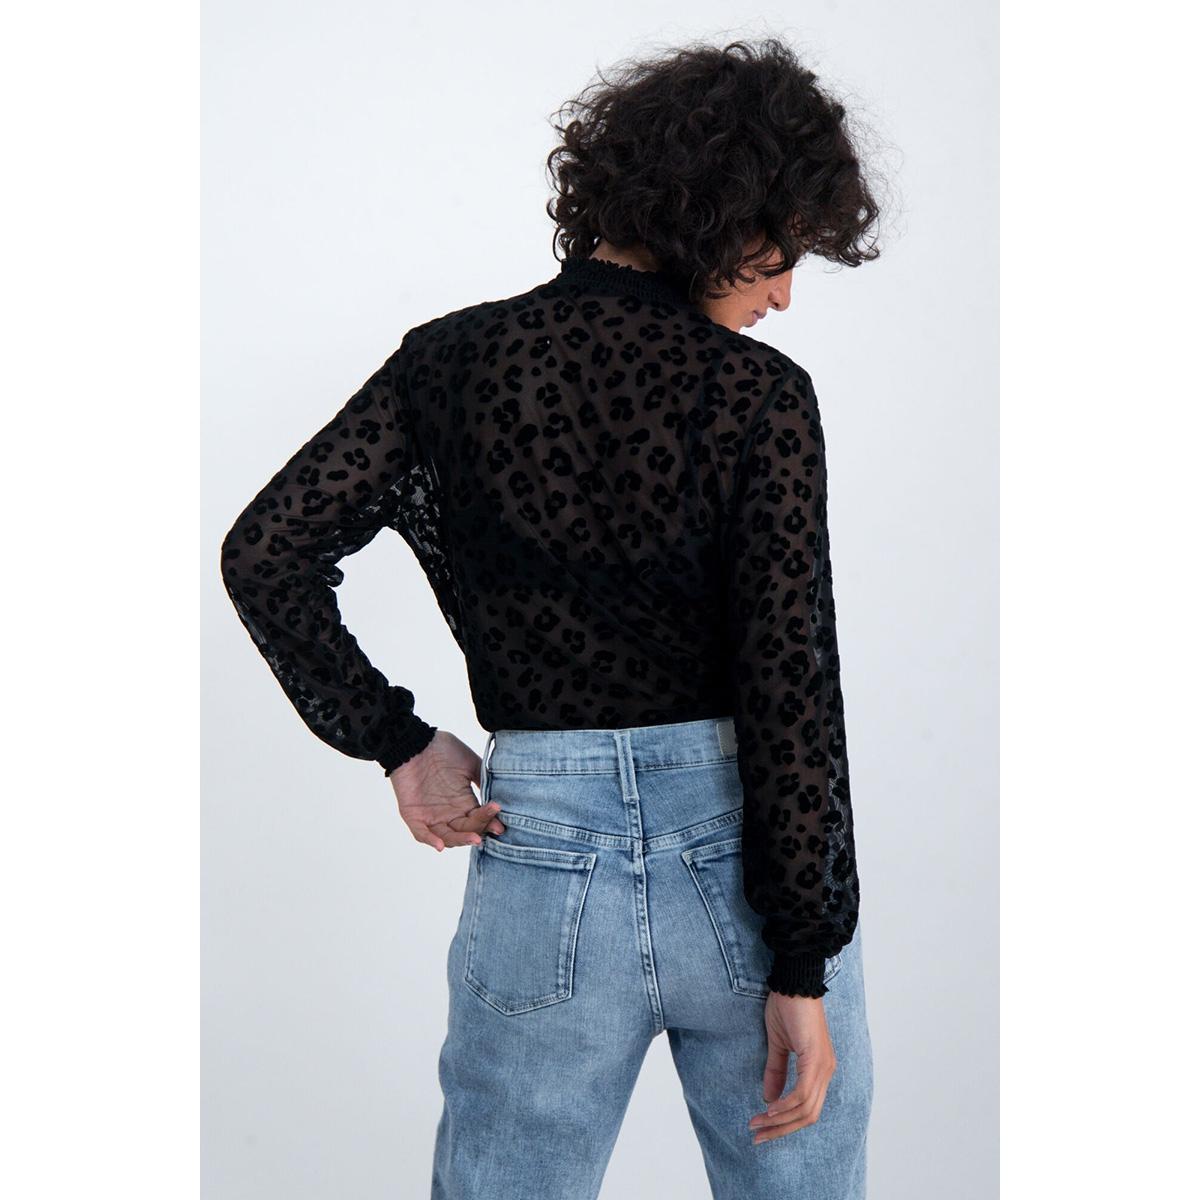 mesh top m00036 garcia t-shirt 60 black